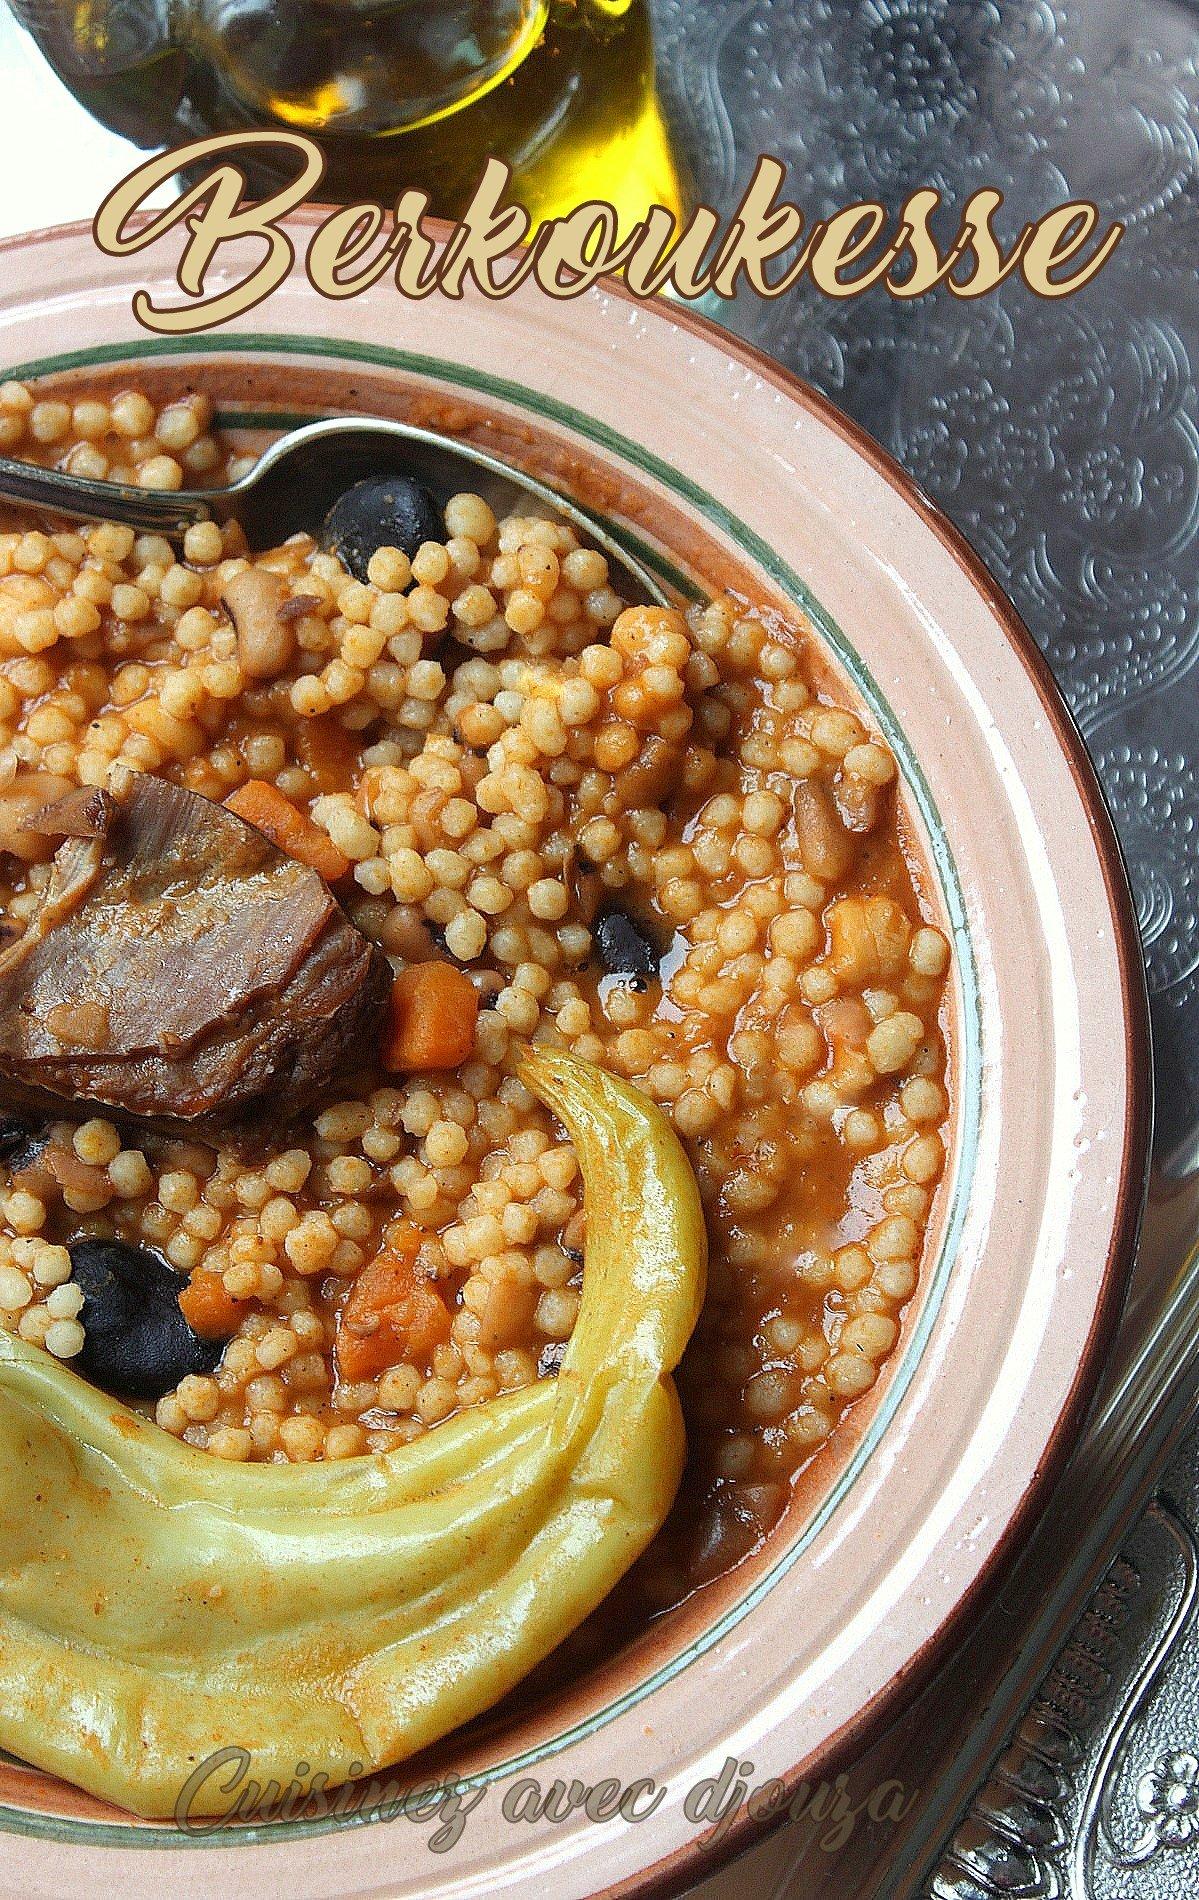 Berkoukes algerien la cuisine de djouza - Cuisine recette algerien ...